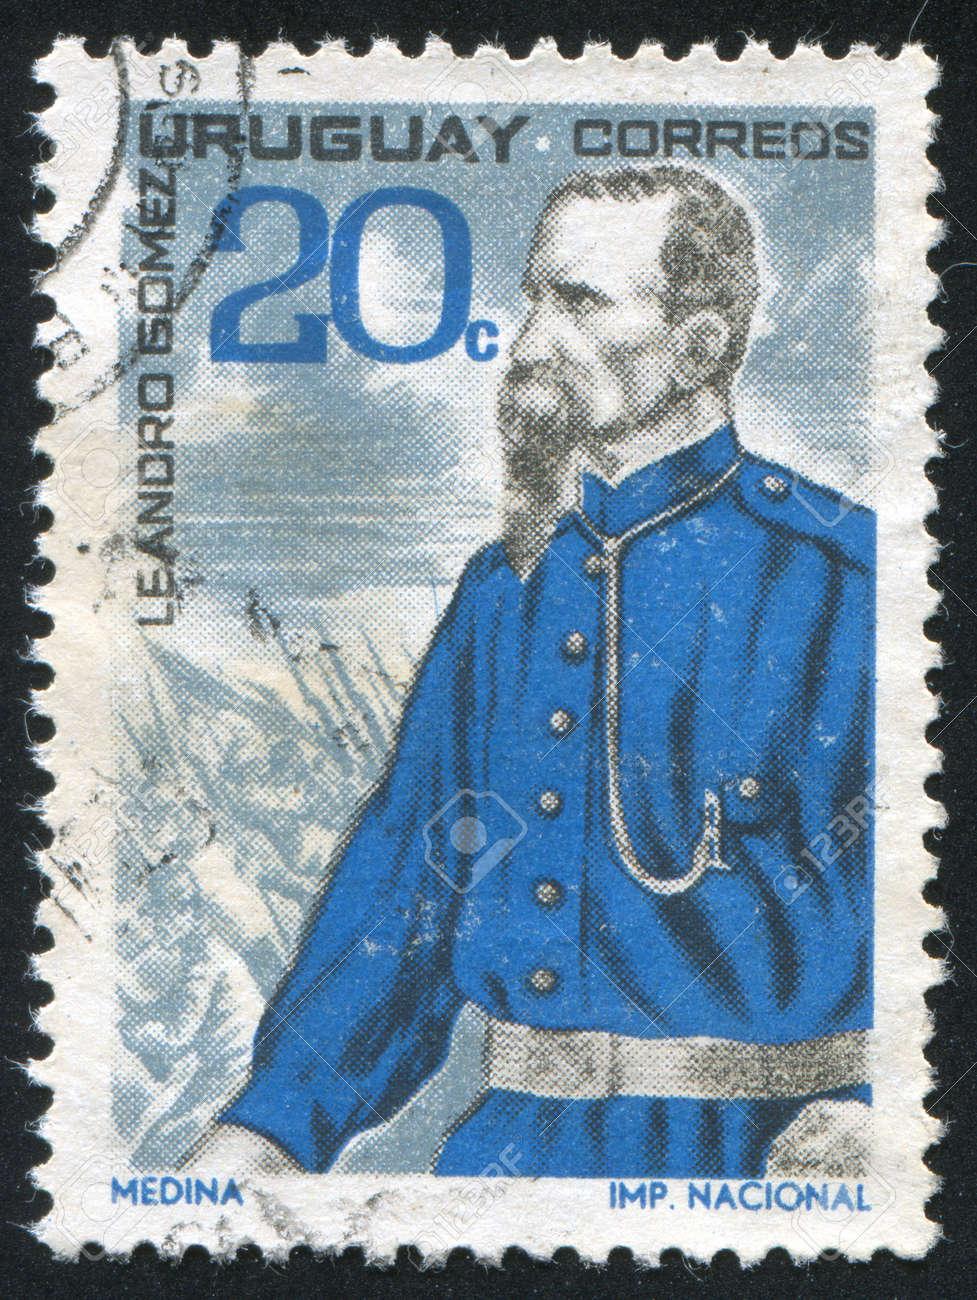 URUGUAY - CIRCA 1966: stamp printed by Uruguay, shows Leandro Gomez, circa 1966 Stock Photo - 14136968